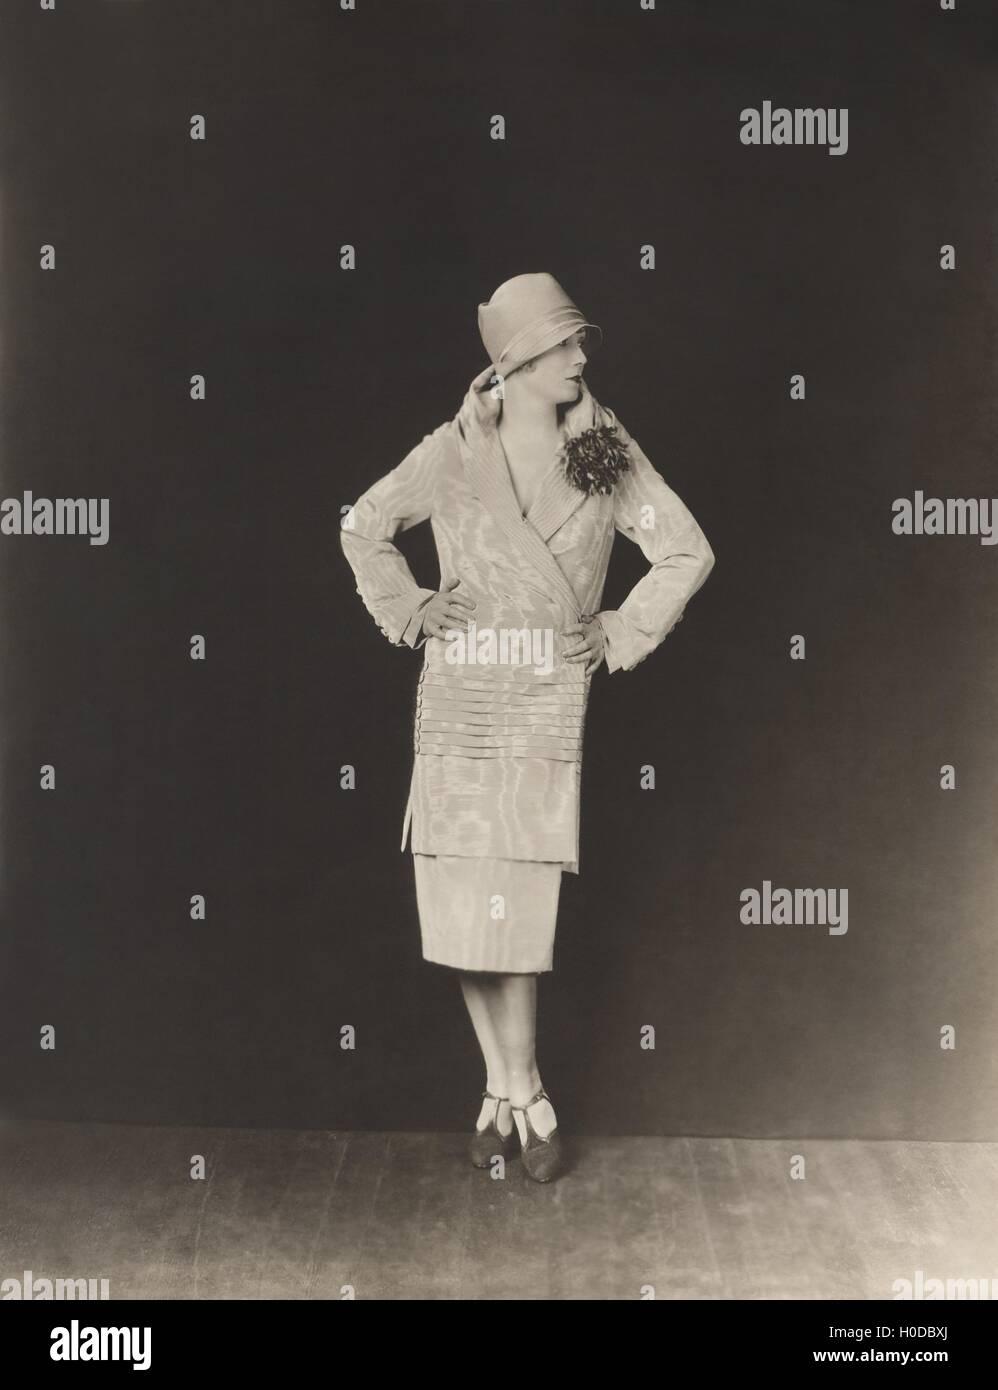 Dressed to impress - Stock Image